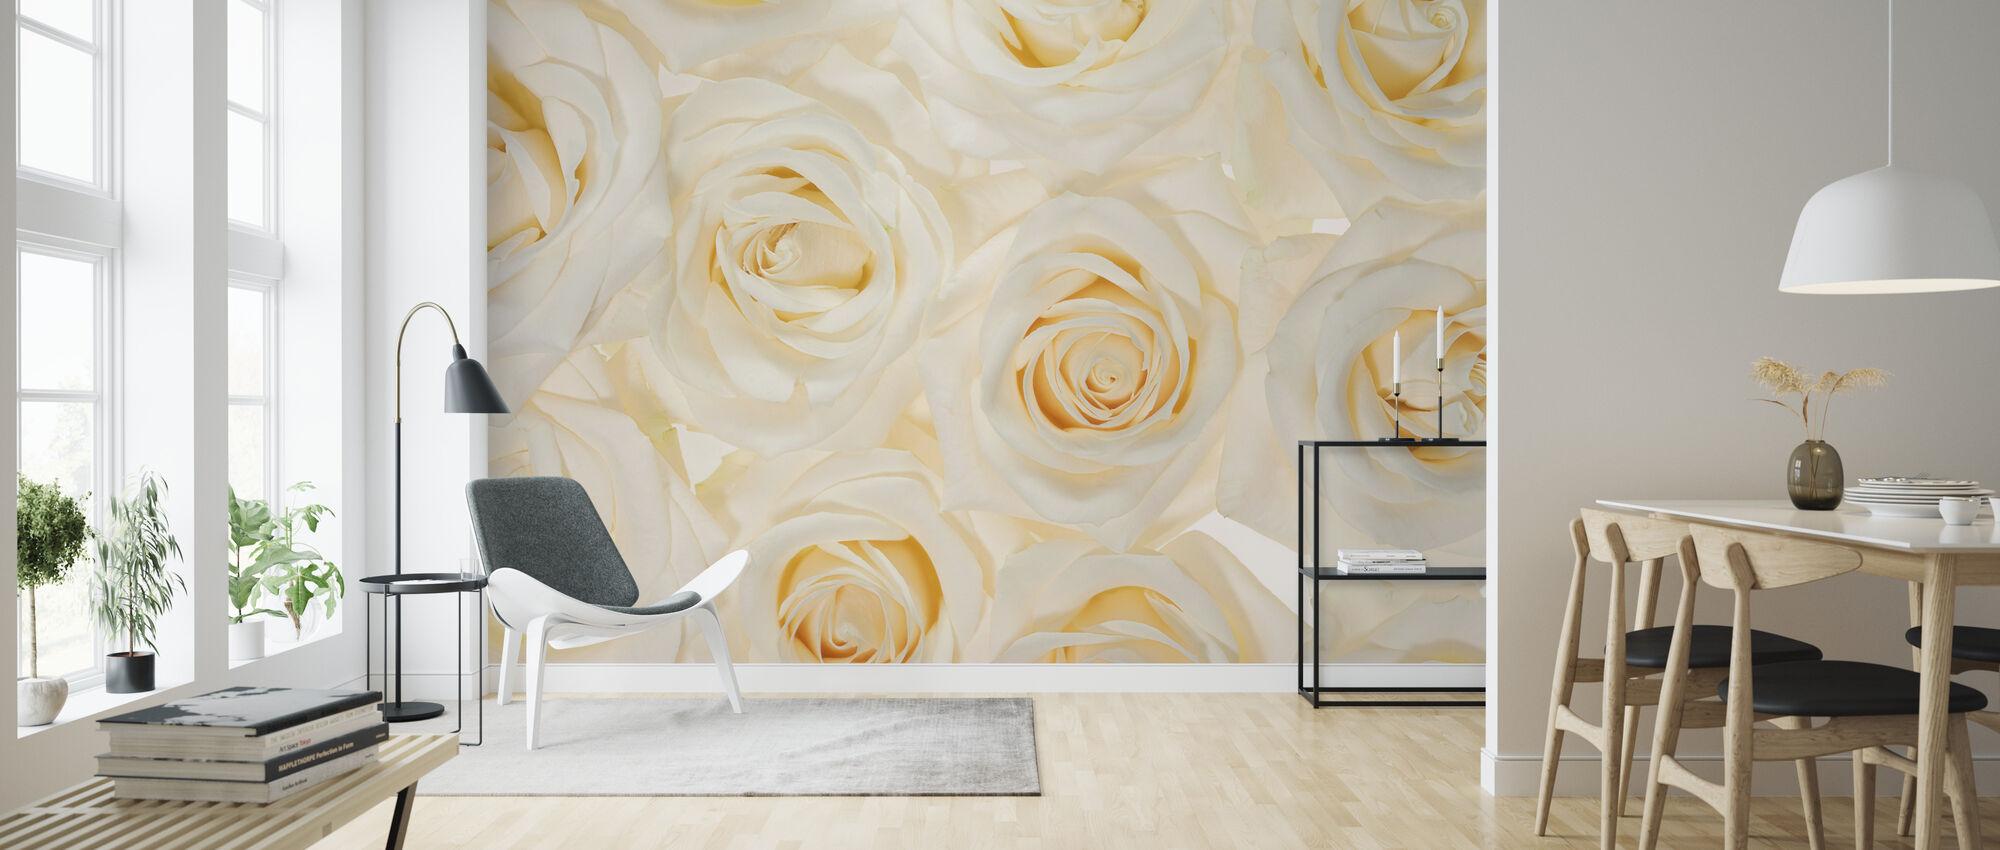 Nice Roses 3 - Wallpaper - Living Room